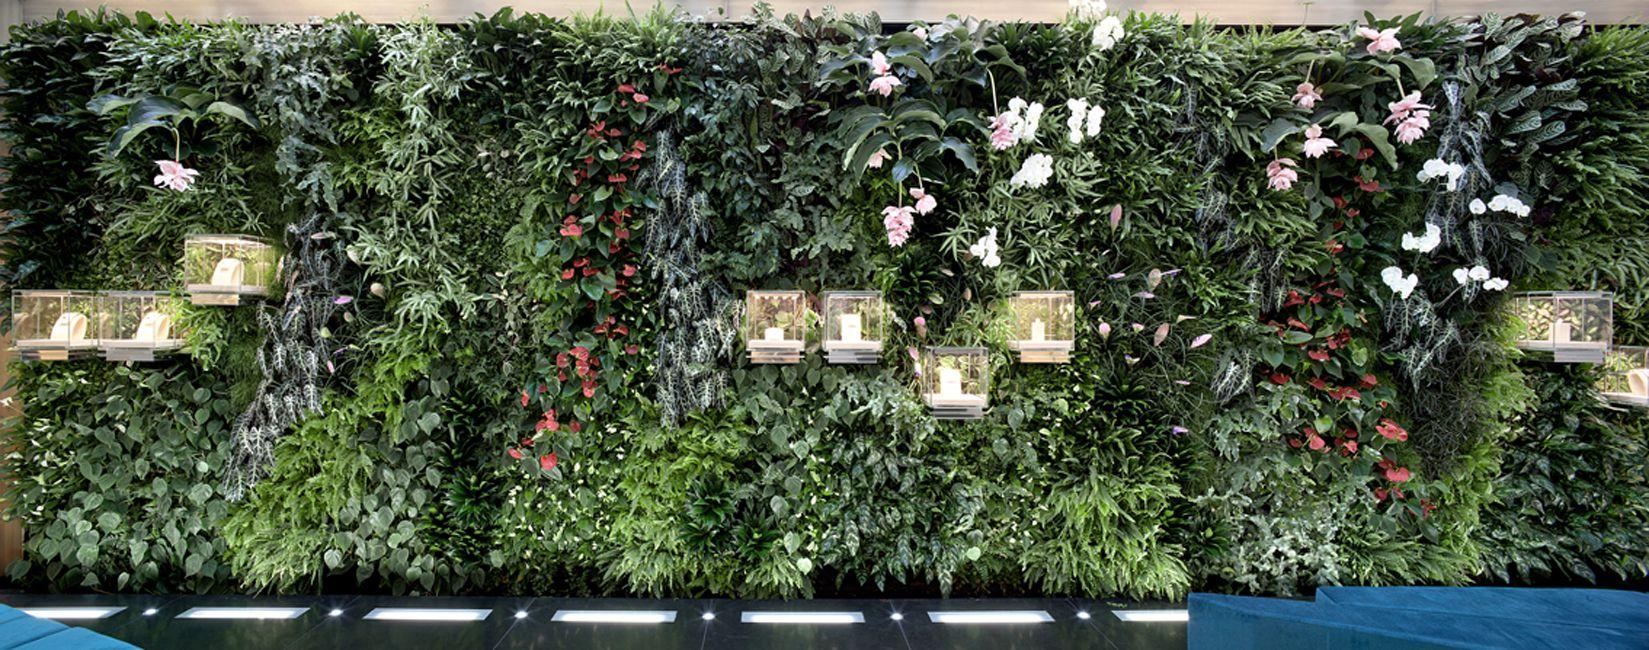 Giardino verticale - Bulgari - Milano  Vertical Gardens  Pinterest